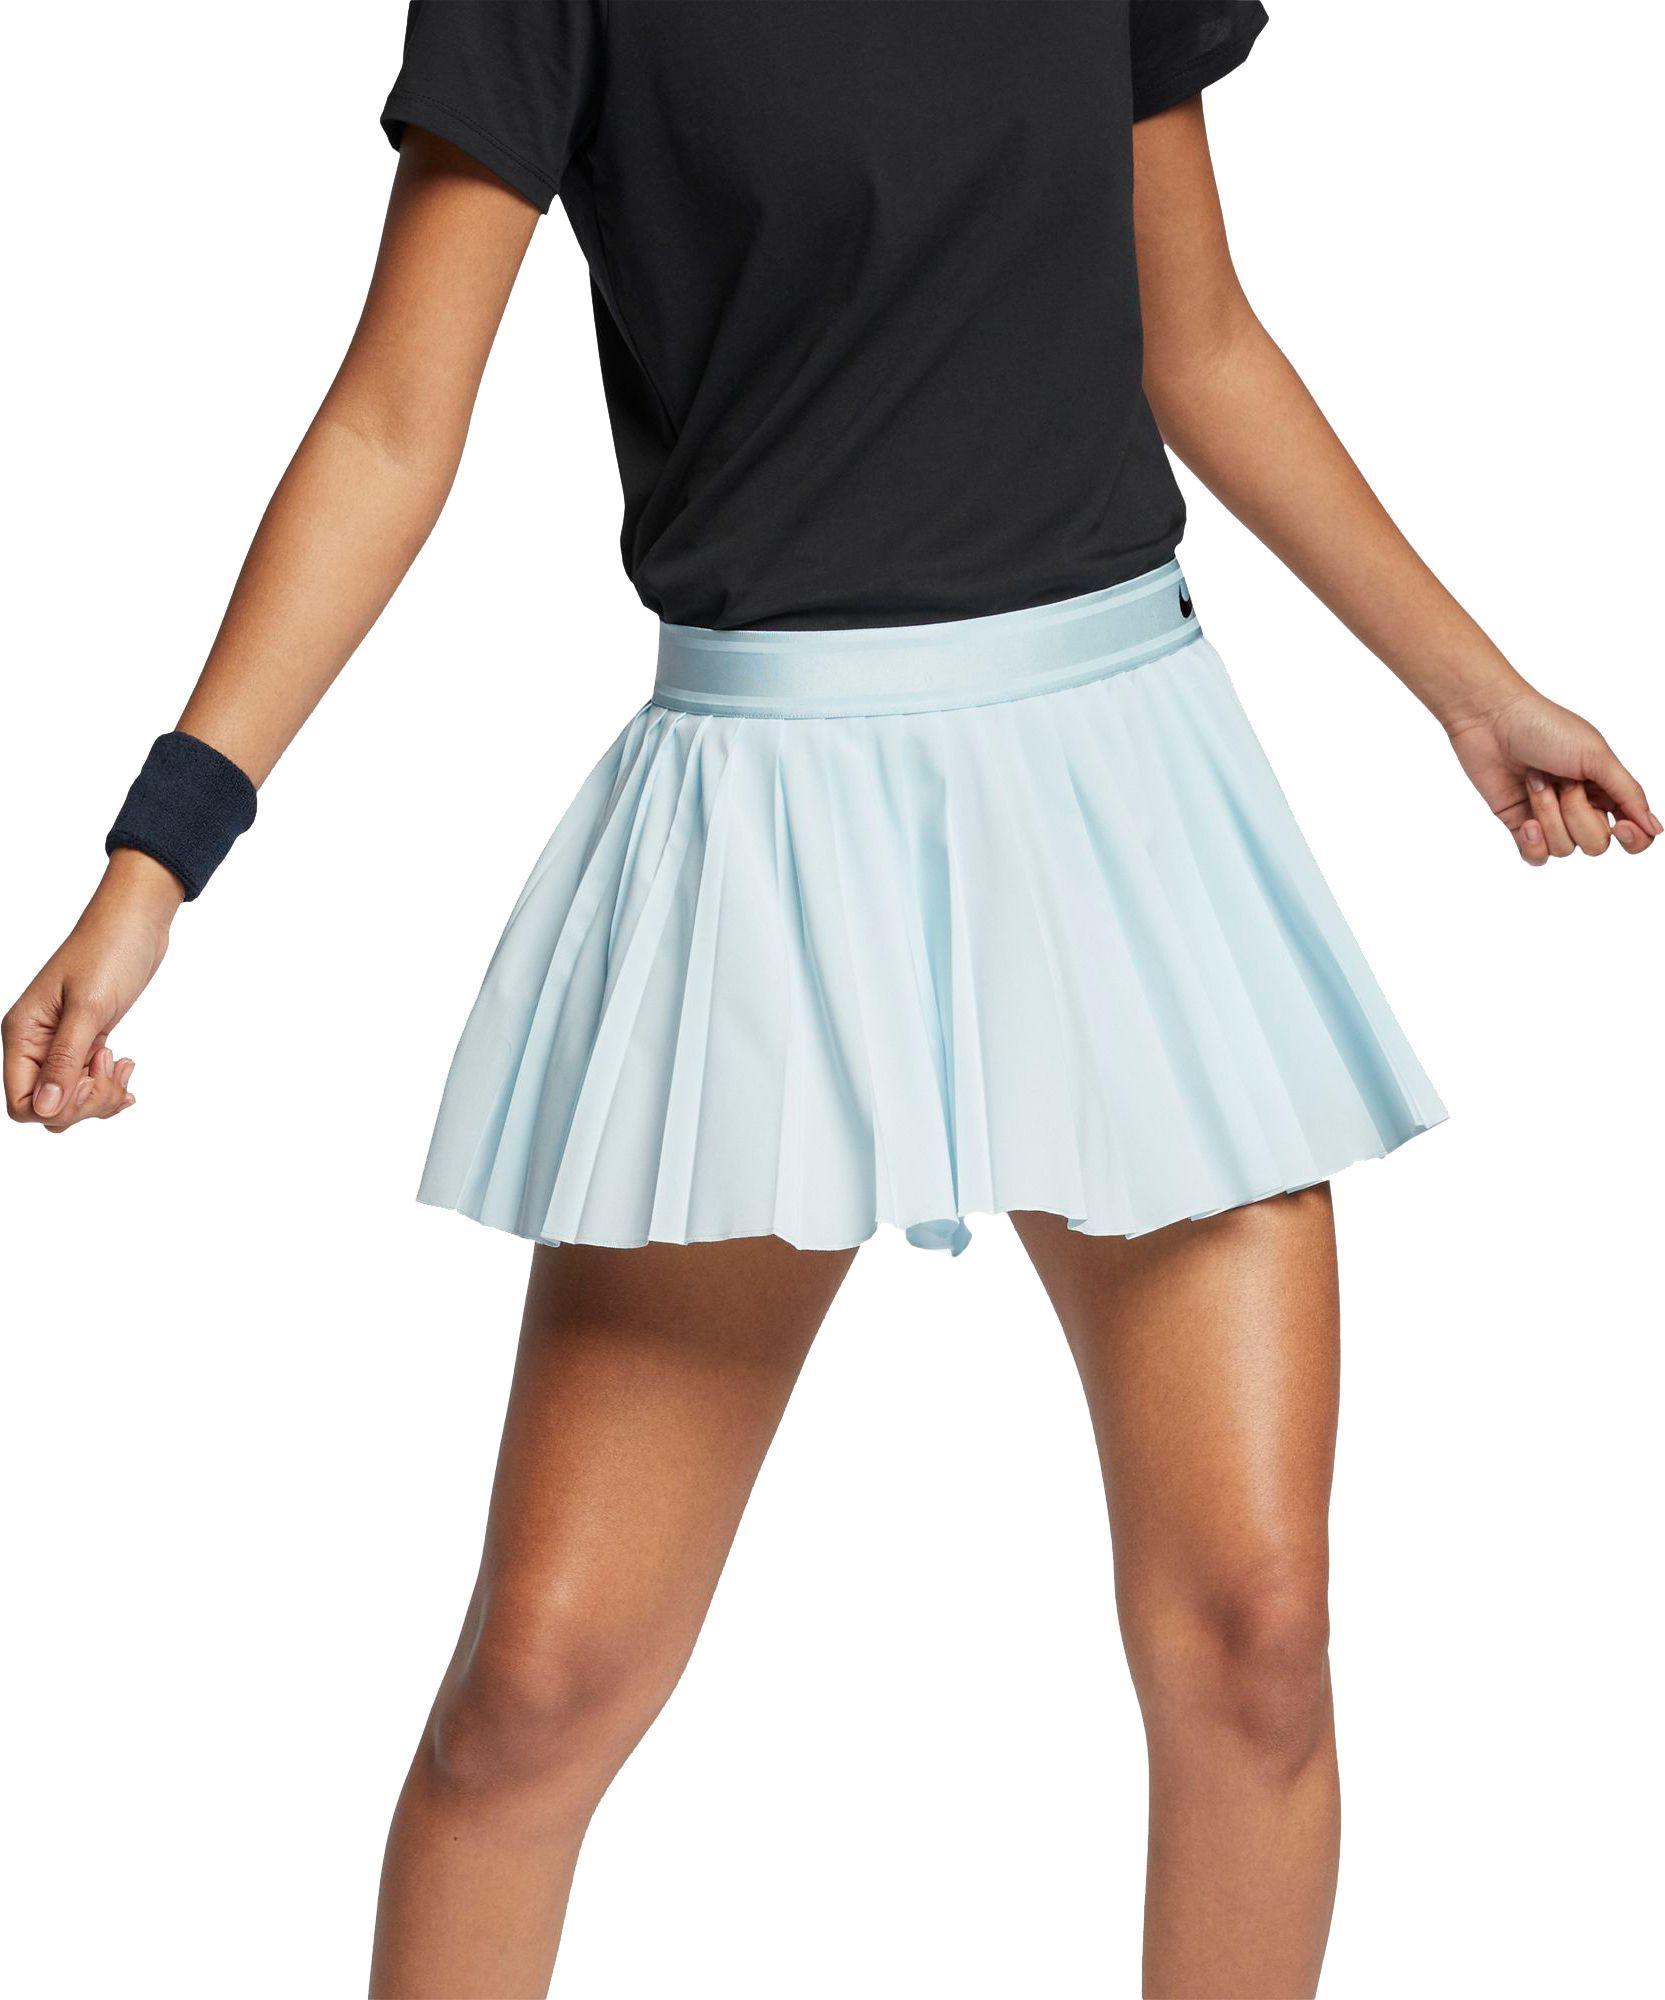 Nike Women S Court Victory Tennis Skirt Size Xl Blue In 2020 Womens Tennis Skirts Tennis Skirt Womens Tennis